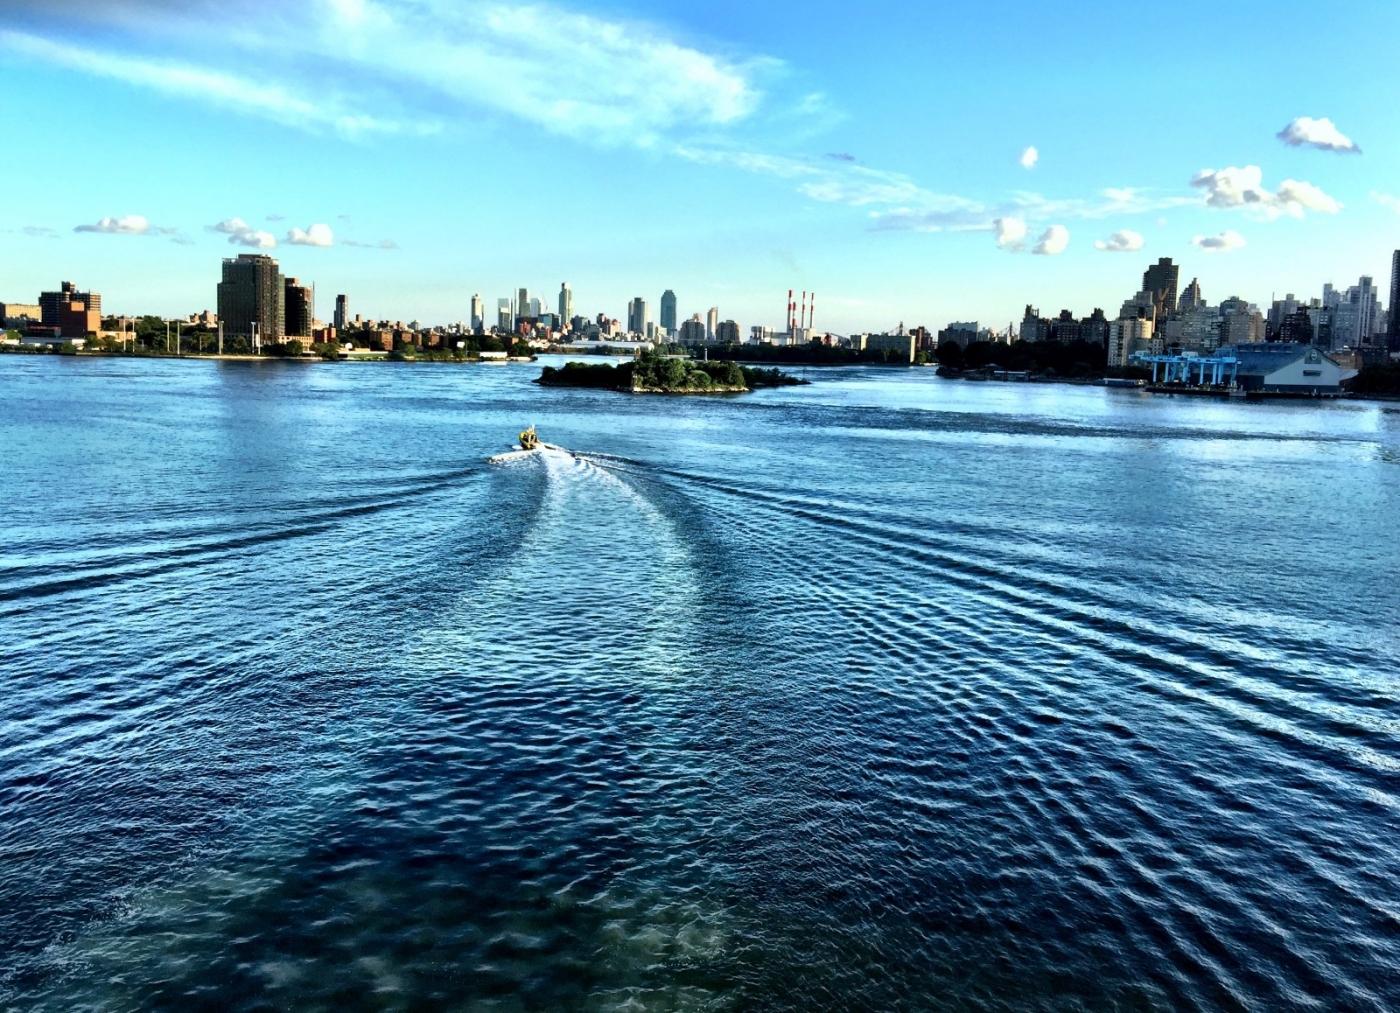 回头一瞅 美在东河 Manhattan East River_图1-1